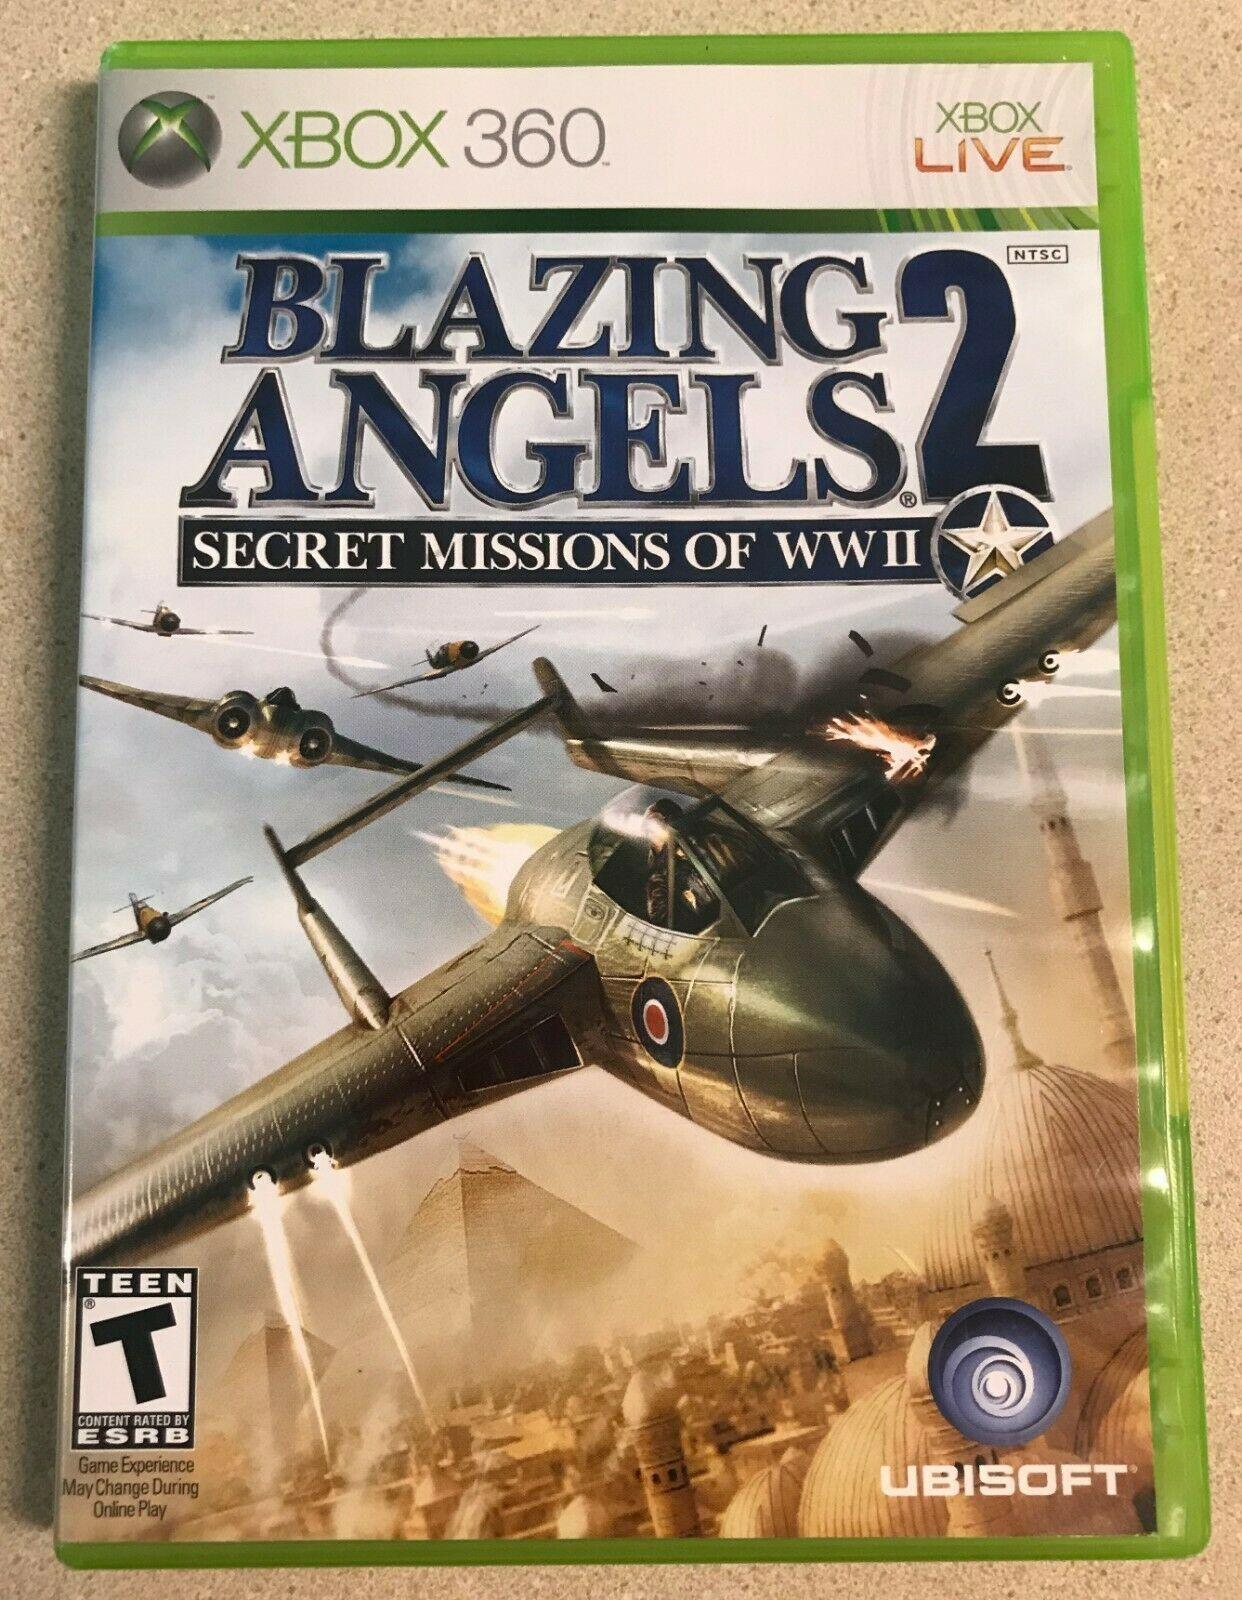 Blazing Angels 2: Secret Missions of WWII (Microsoft Xbox 360, 2007) Game